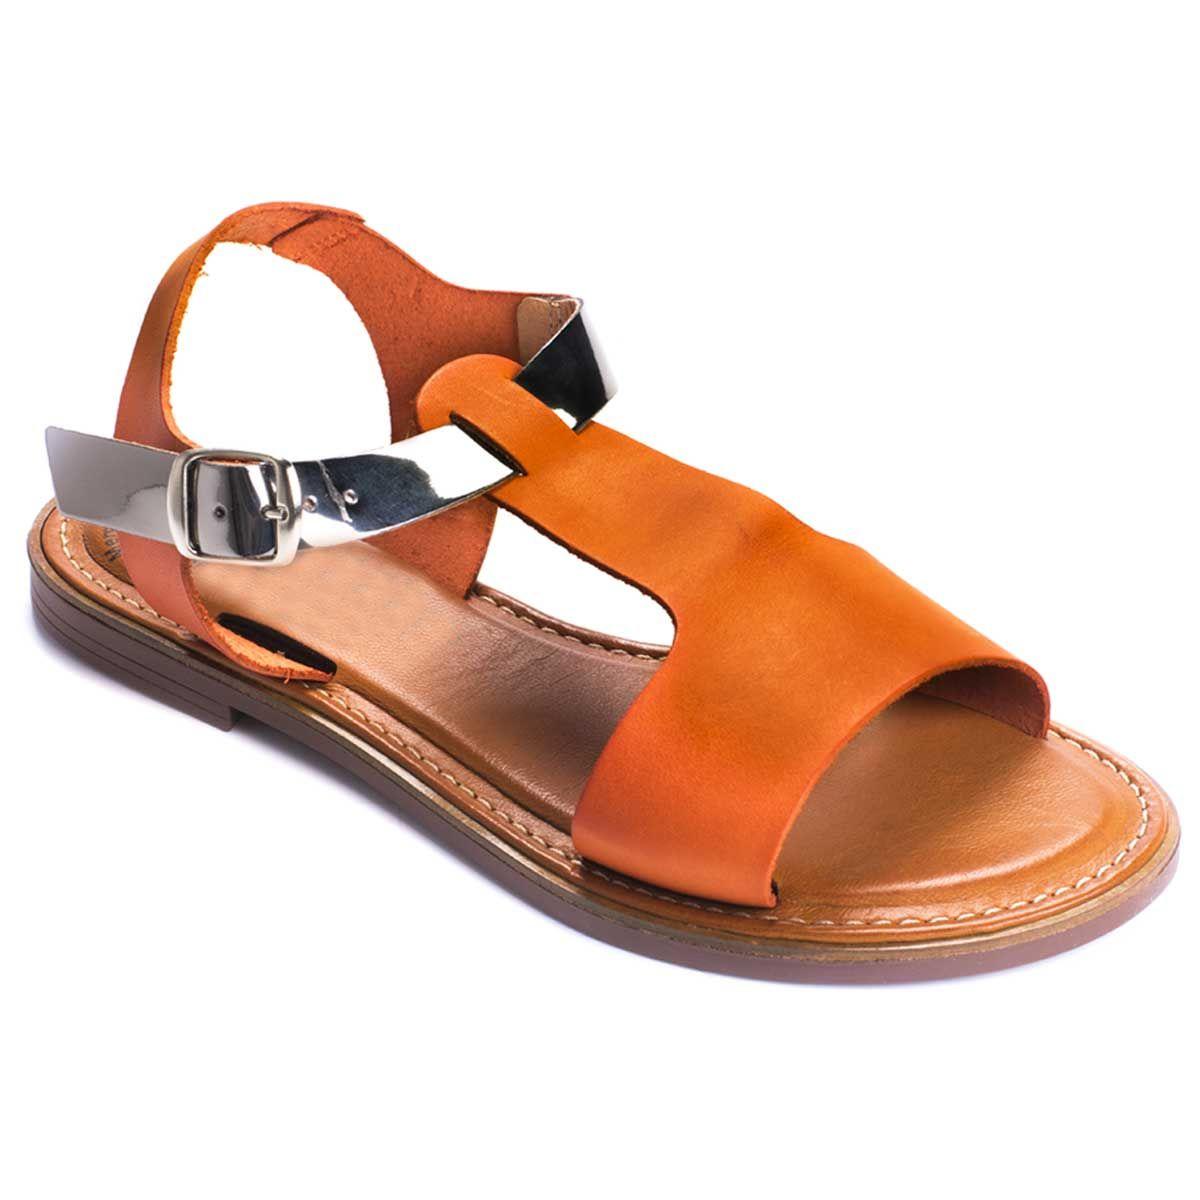 Purapiel Flat Sandal in Orange